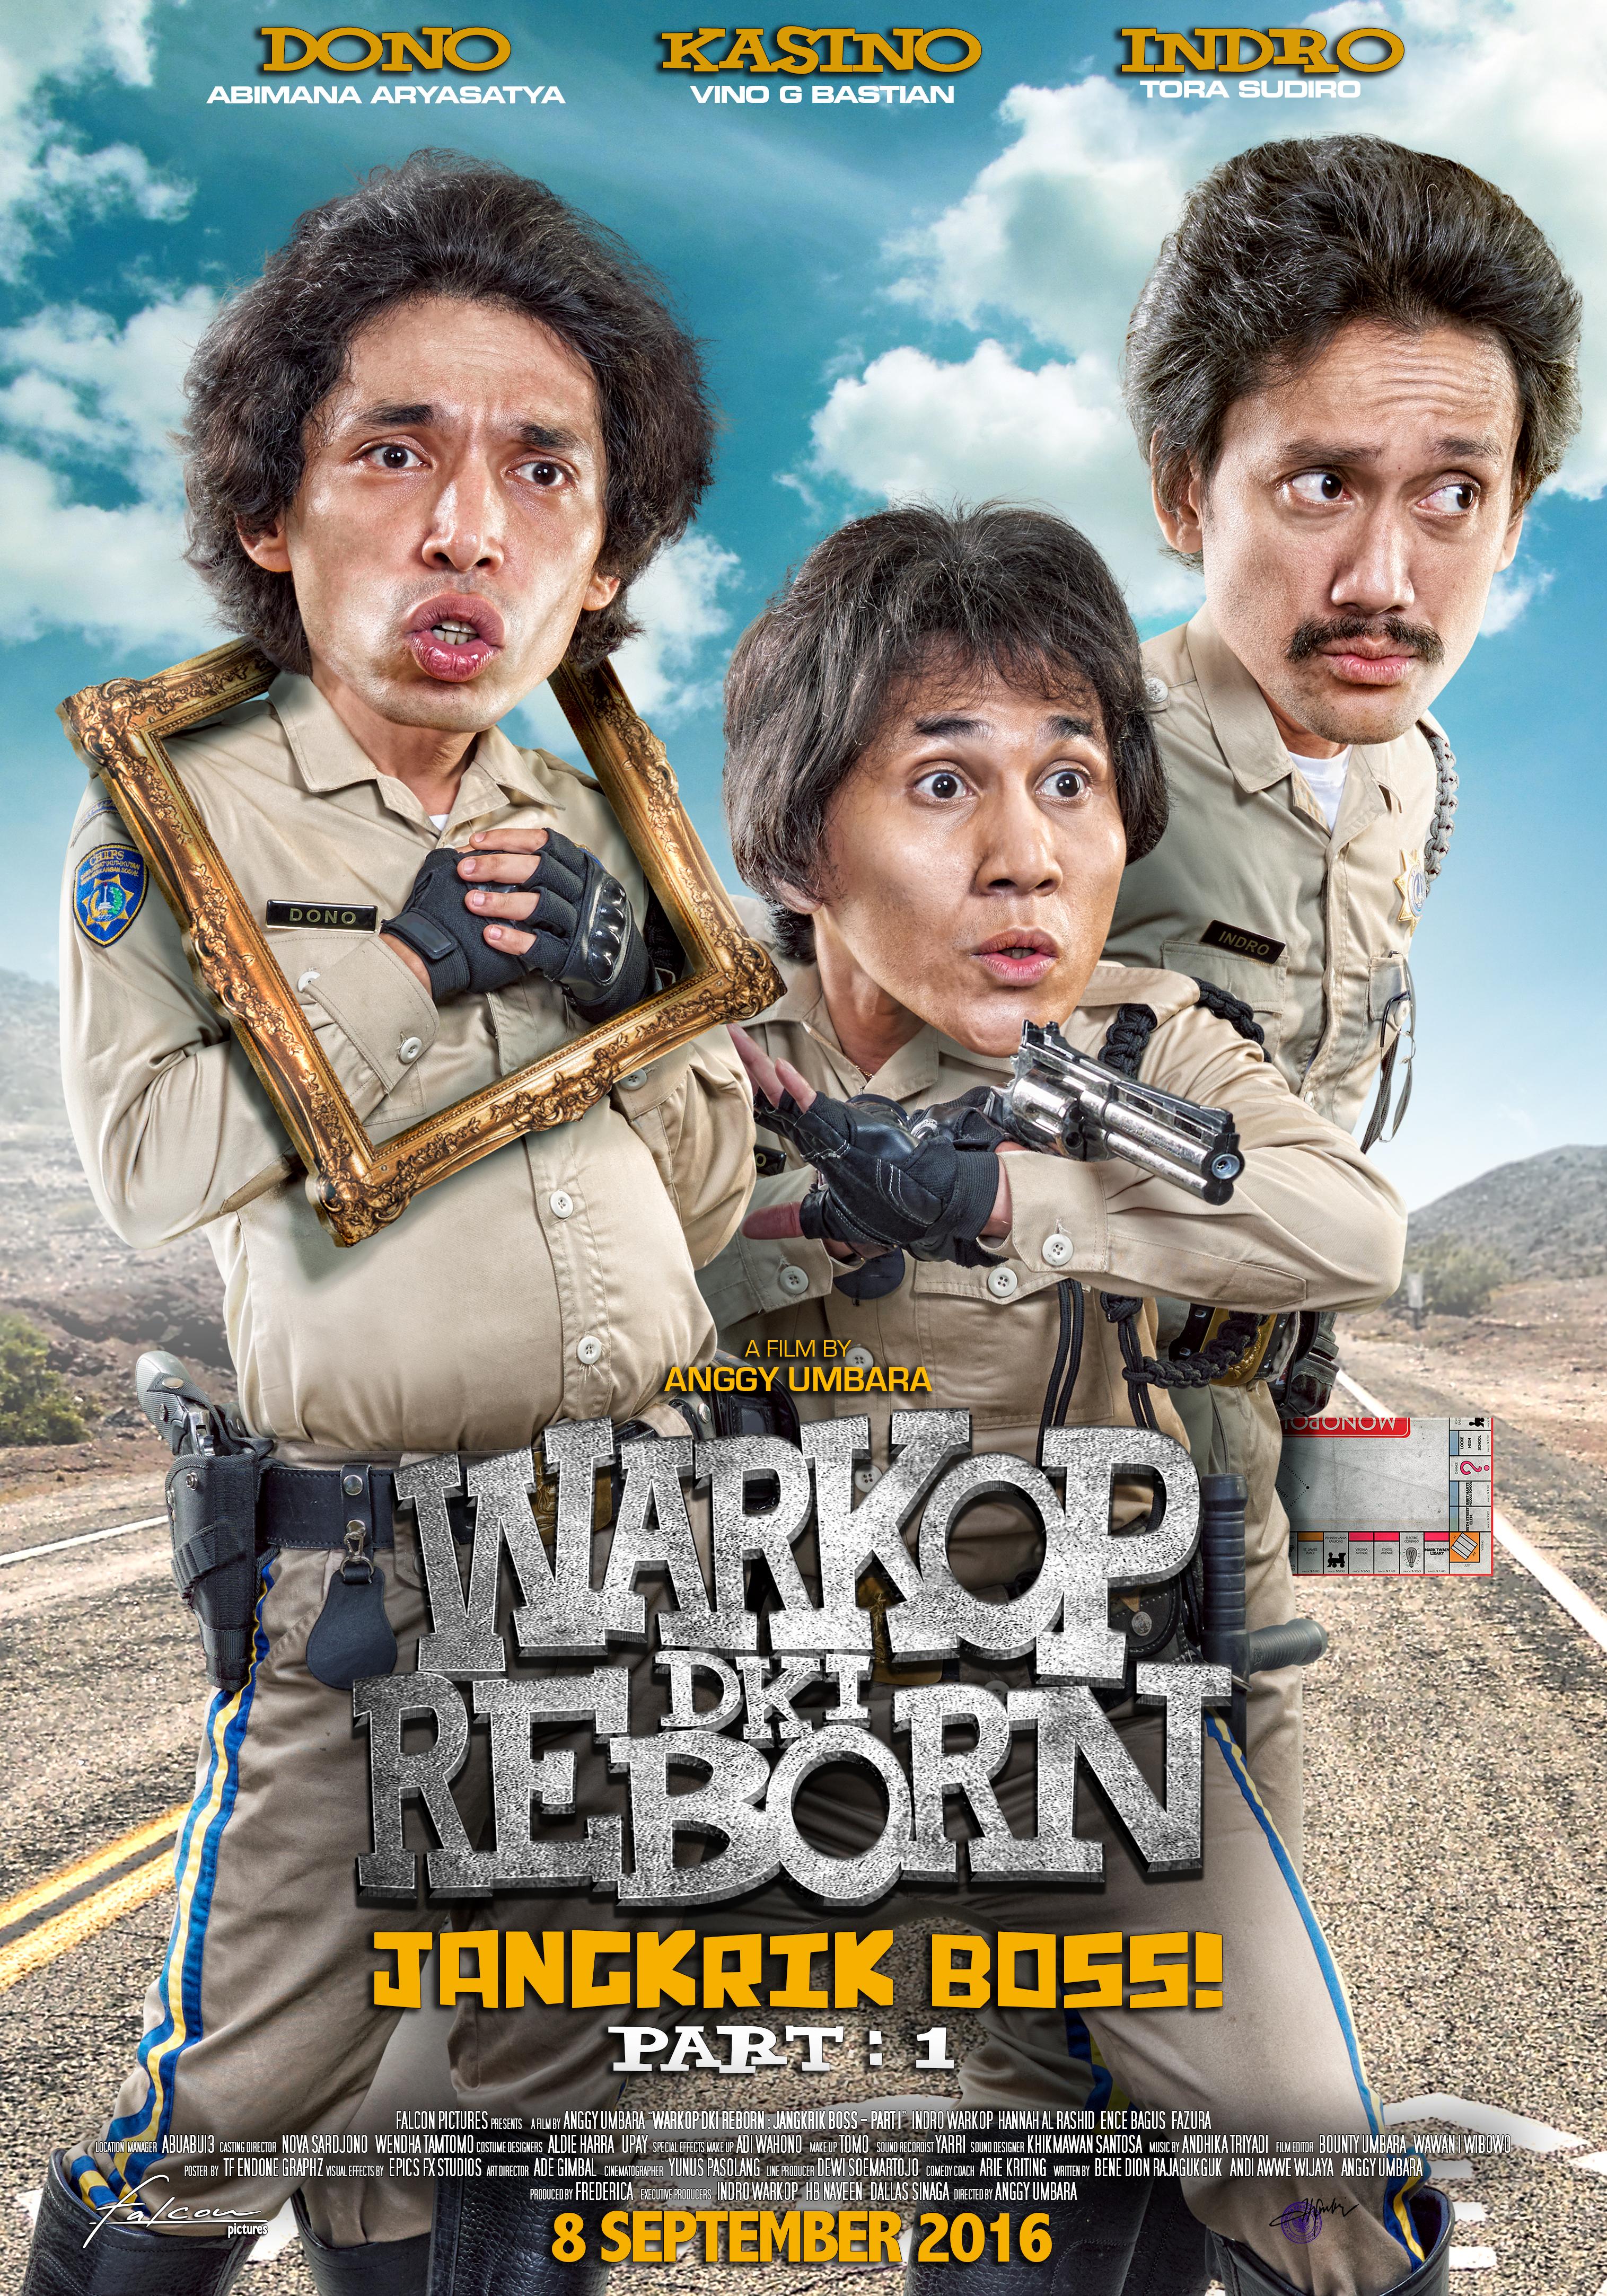 warkop dki reborn jangkrik boss part 1 2016 imdb rh imdb com download film warkop dki reborn jangkrik boss part 2 bluray download film warkop dki reborn jangkrik boss 1